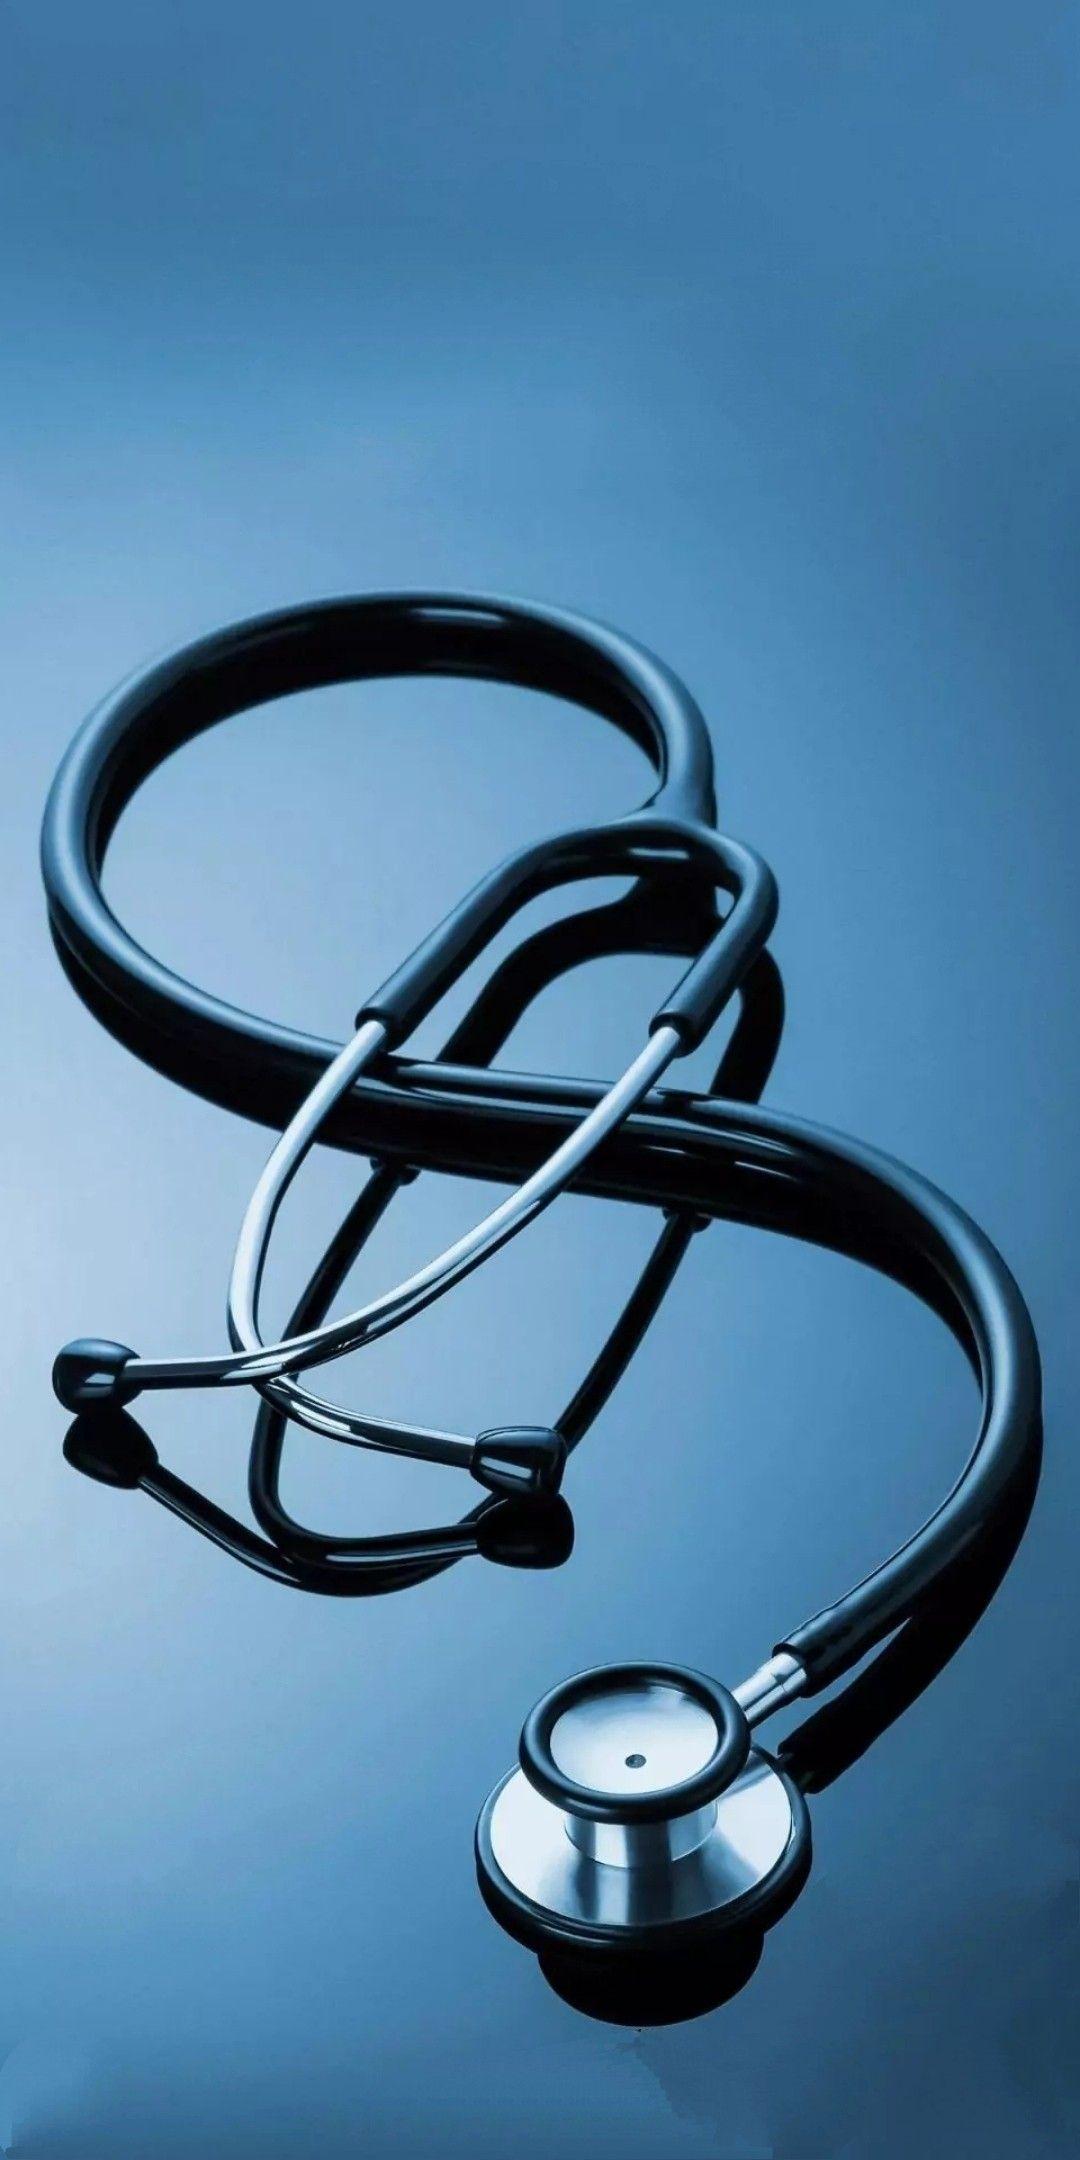 Stethoscope wallpaper for doctors Medical school inspiration 1080x2160